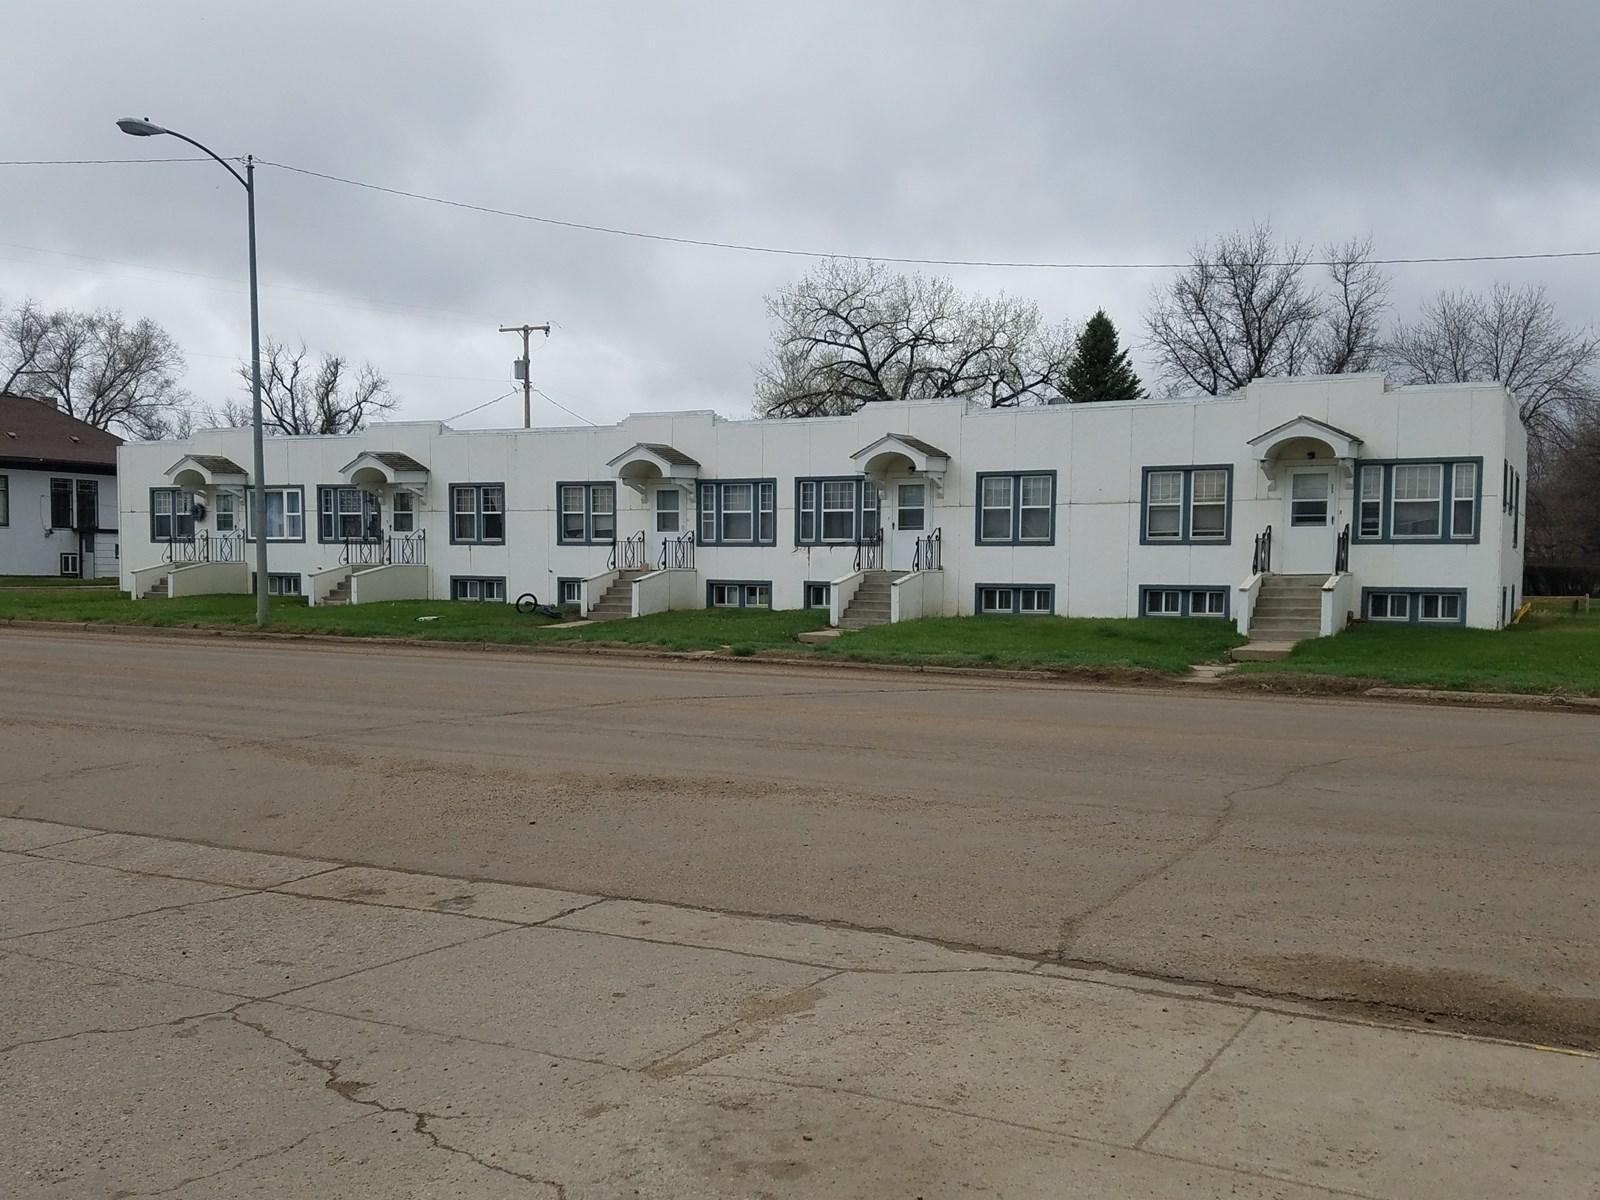 5 Unit Apartment Complex